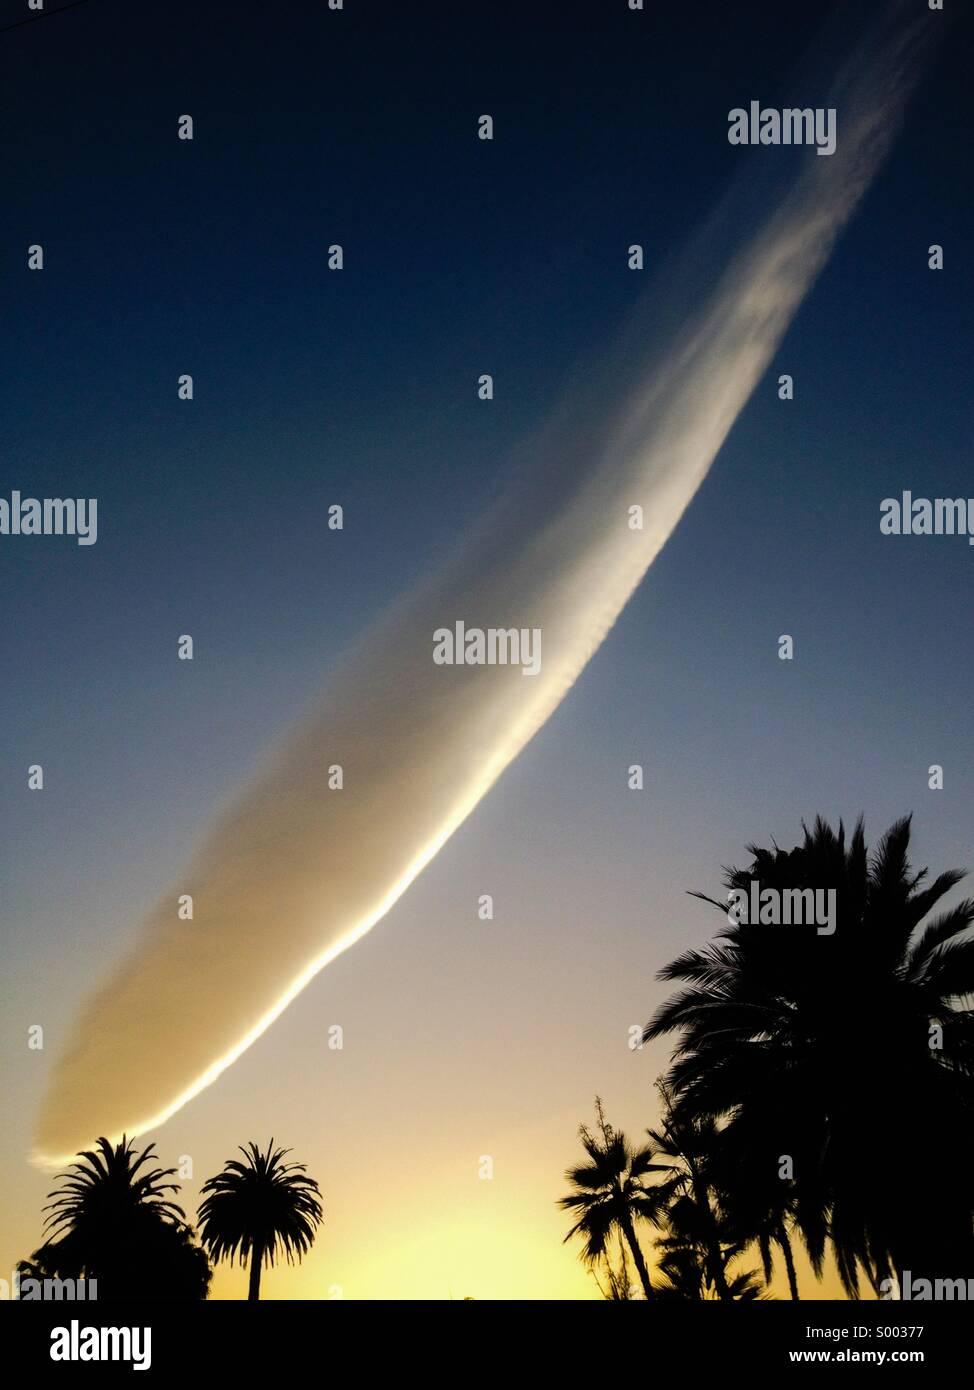 Wing like cloud formation over Santa Barbara, CA, USA - Stock Image